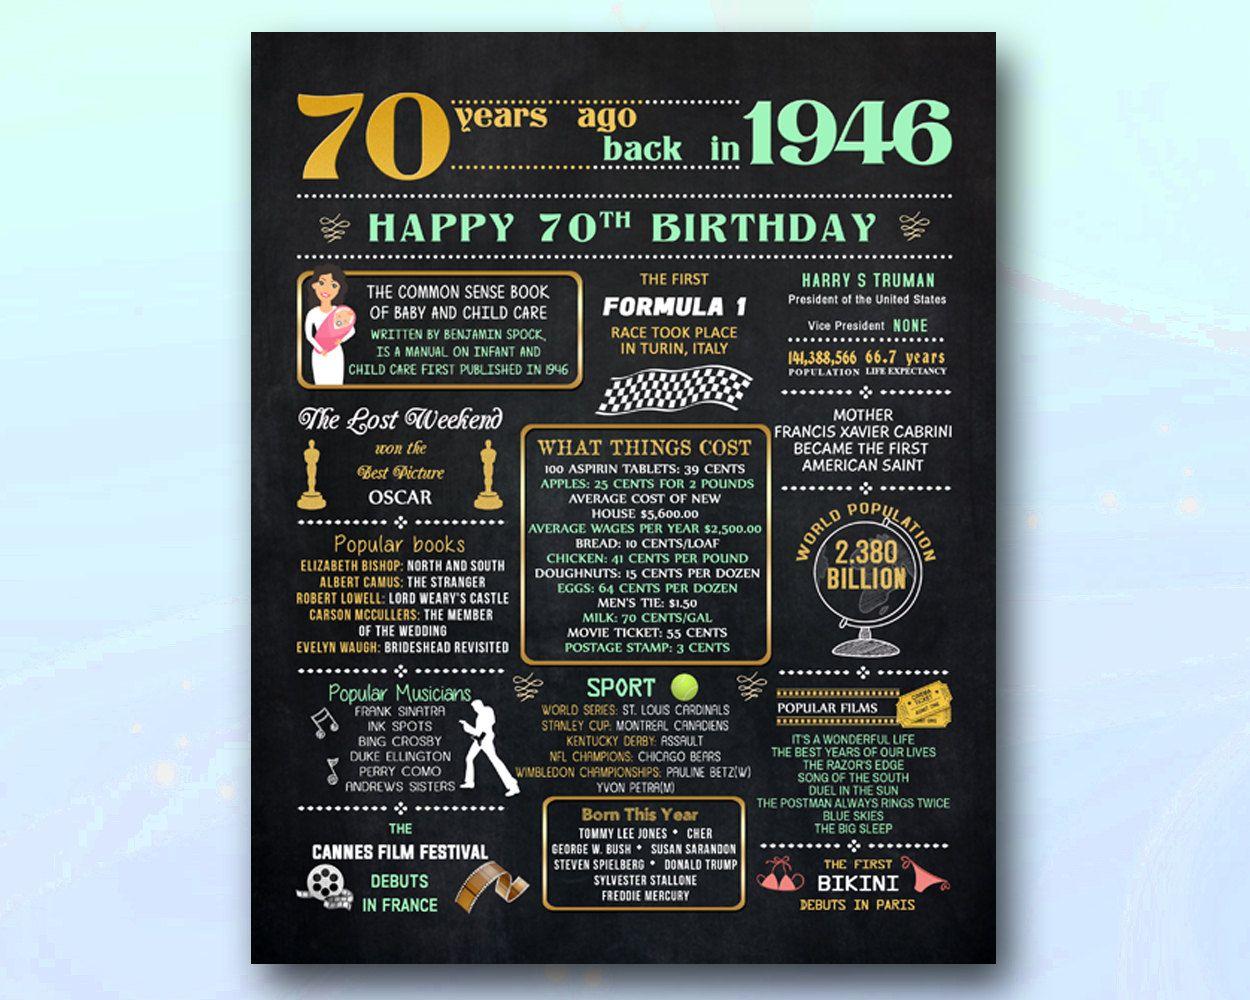 70th Birthday Sign Chalkboard Poster Back In 1946 Por Sportbirthday